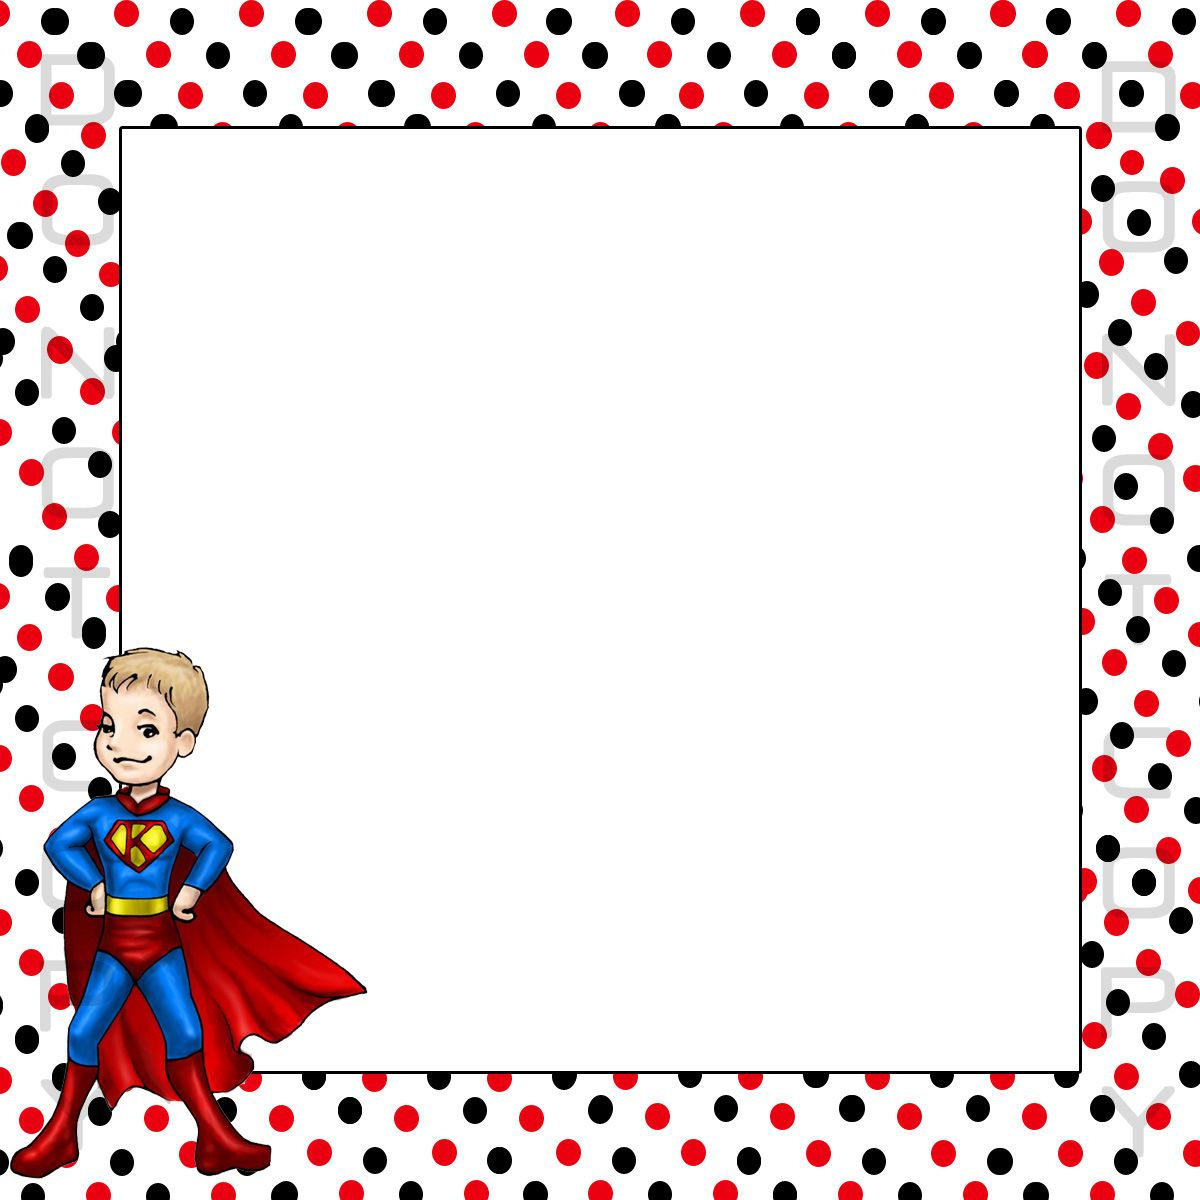 Sticker Frame easypeasy Superman Party Boys Birthday